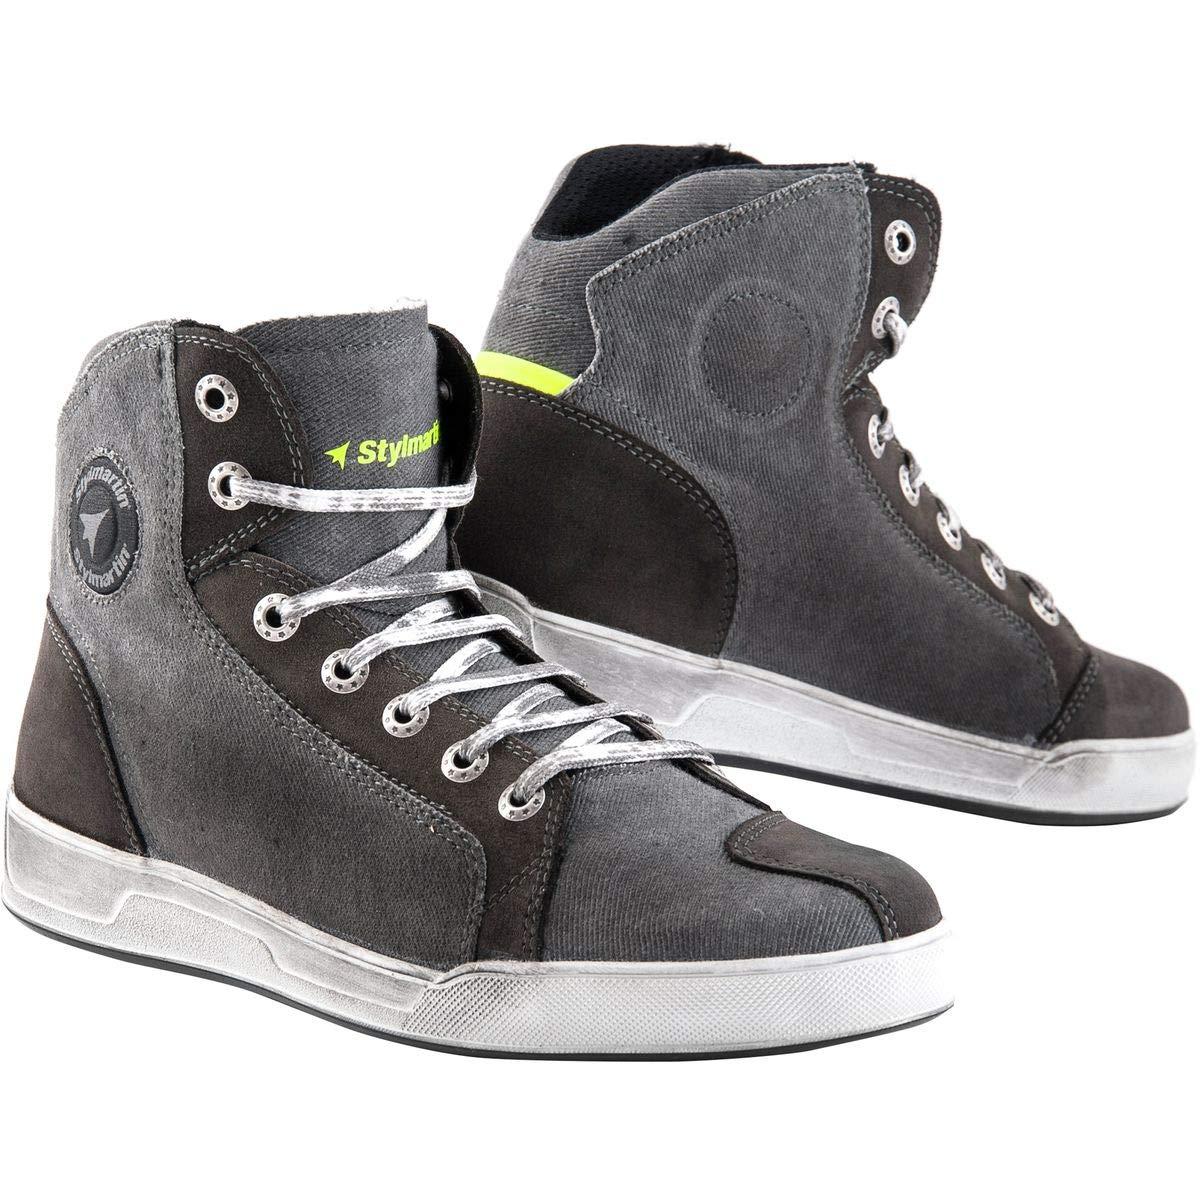 Stylmartin Adult Sunset Evo Urban Line Sneakers Grey Size: US-11.5, EU-45